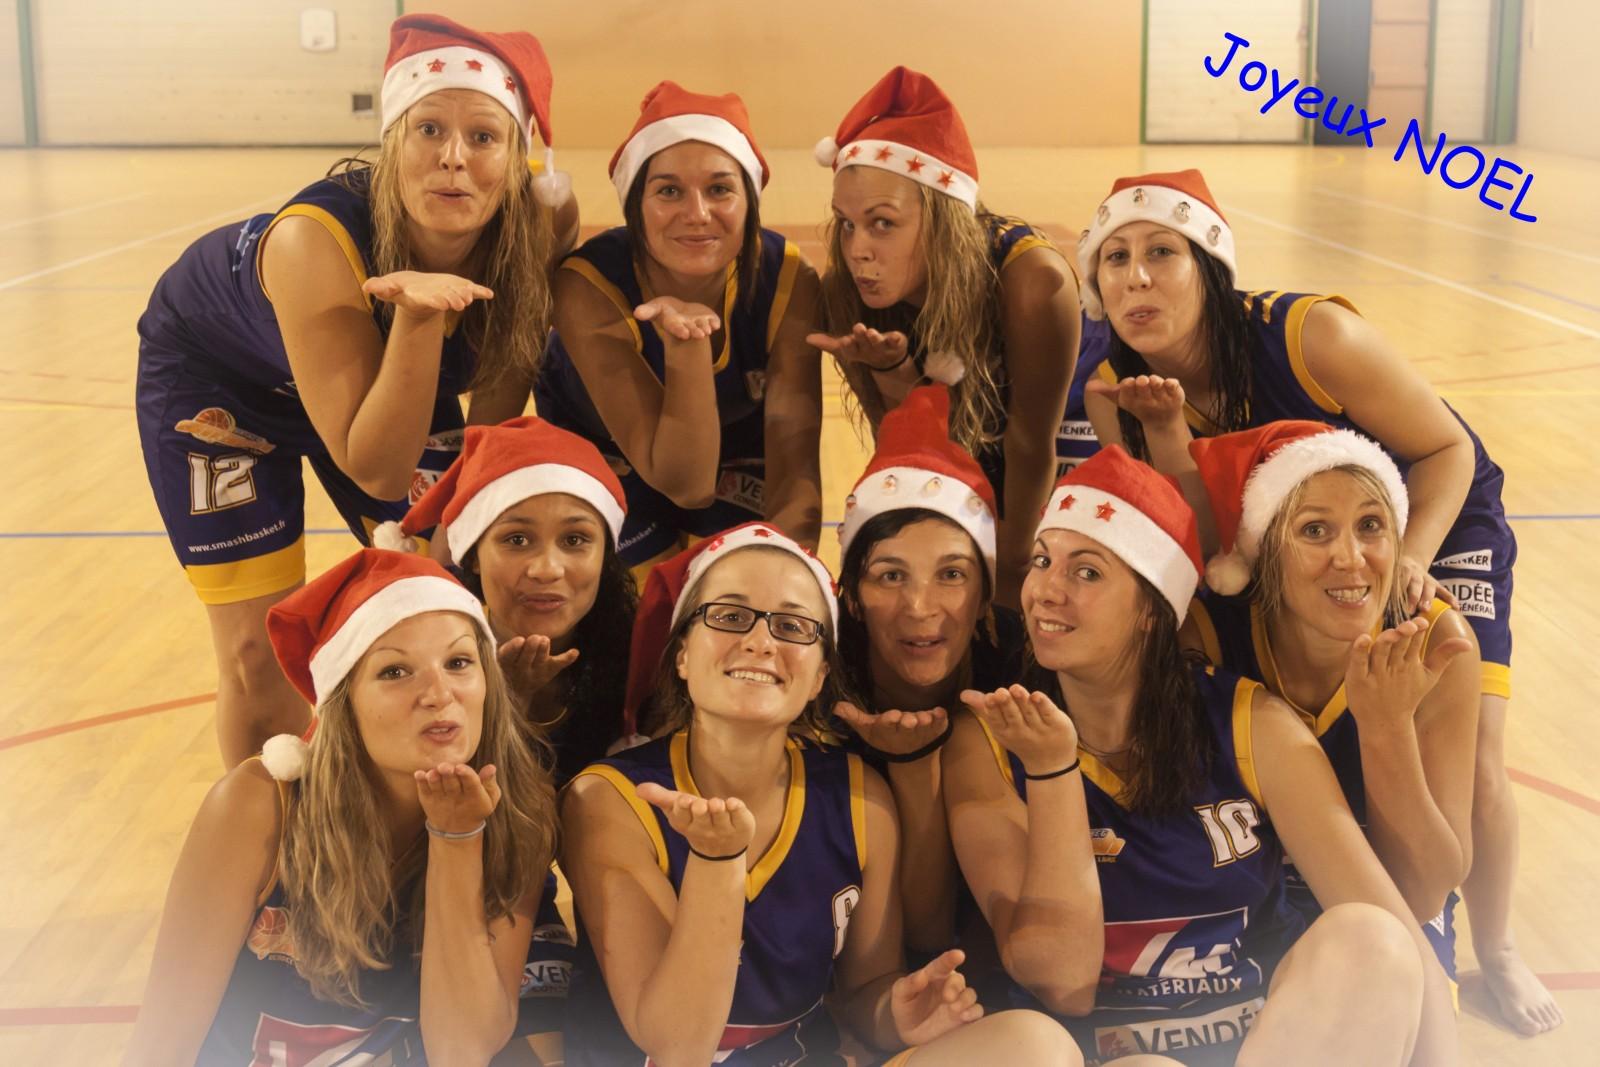 Joyeux Noel nf3-1